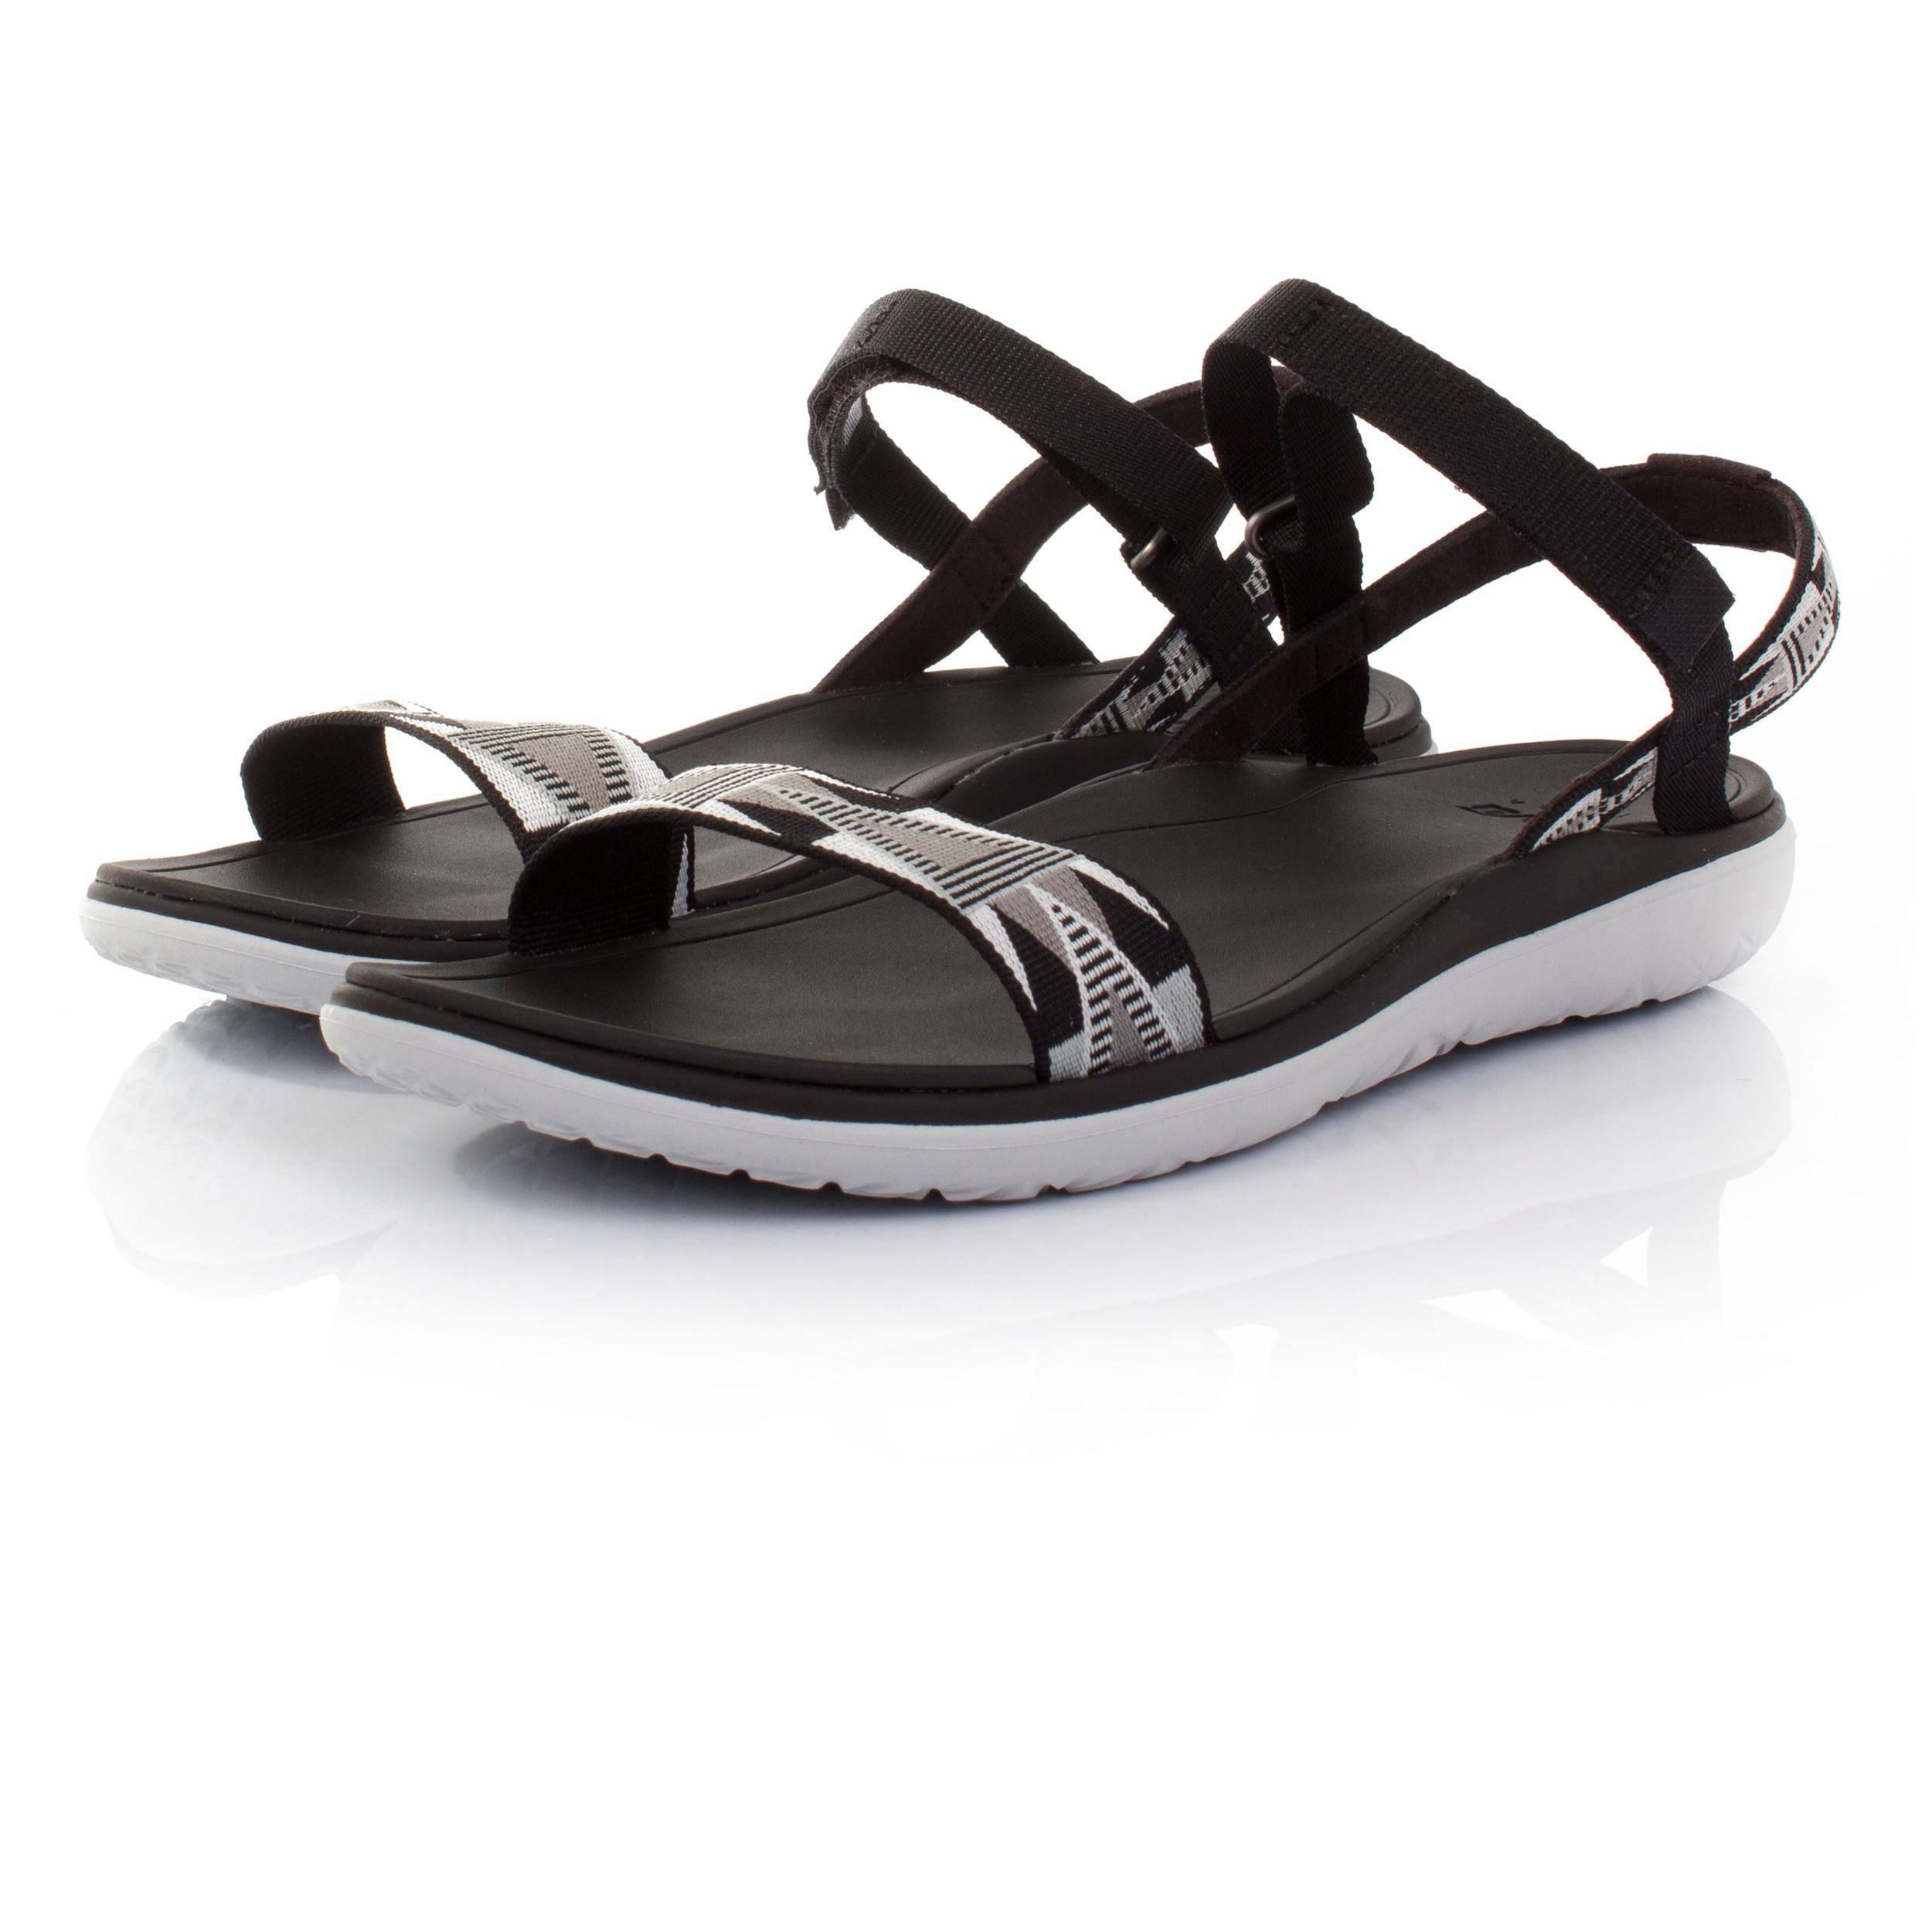 teva terra float nova damen trekkingsandalen wanderschuhe sandalen mehrfarbig ebay. Black Bedroom Furniture Sets. Home Design Ideas